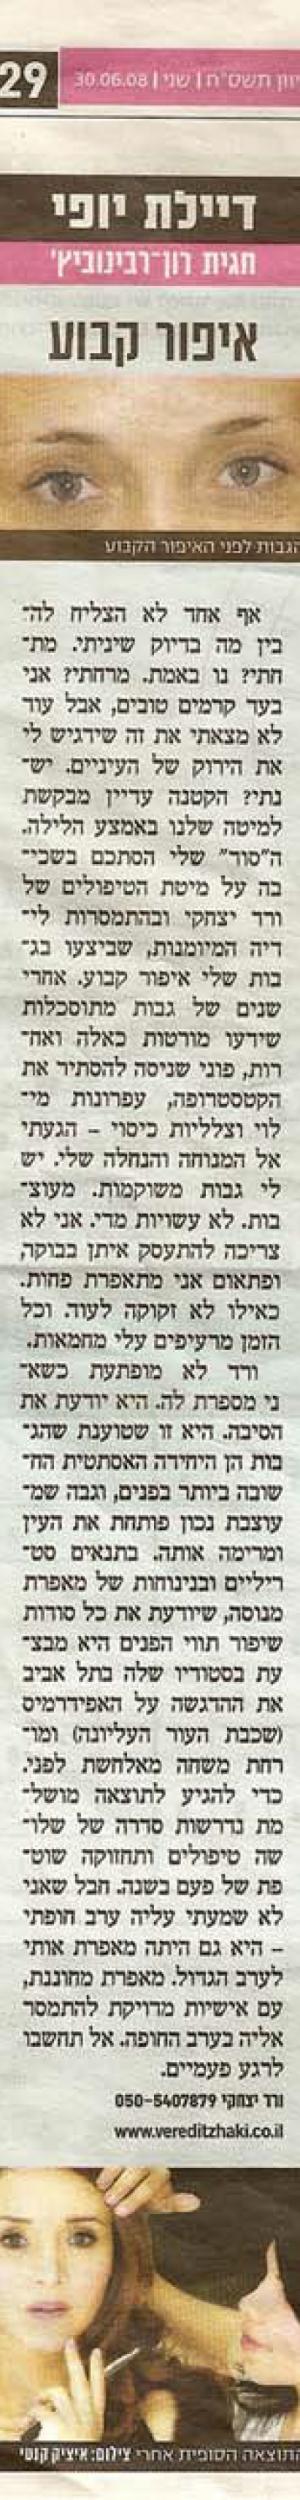 israelhayom_30-06-08